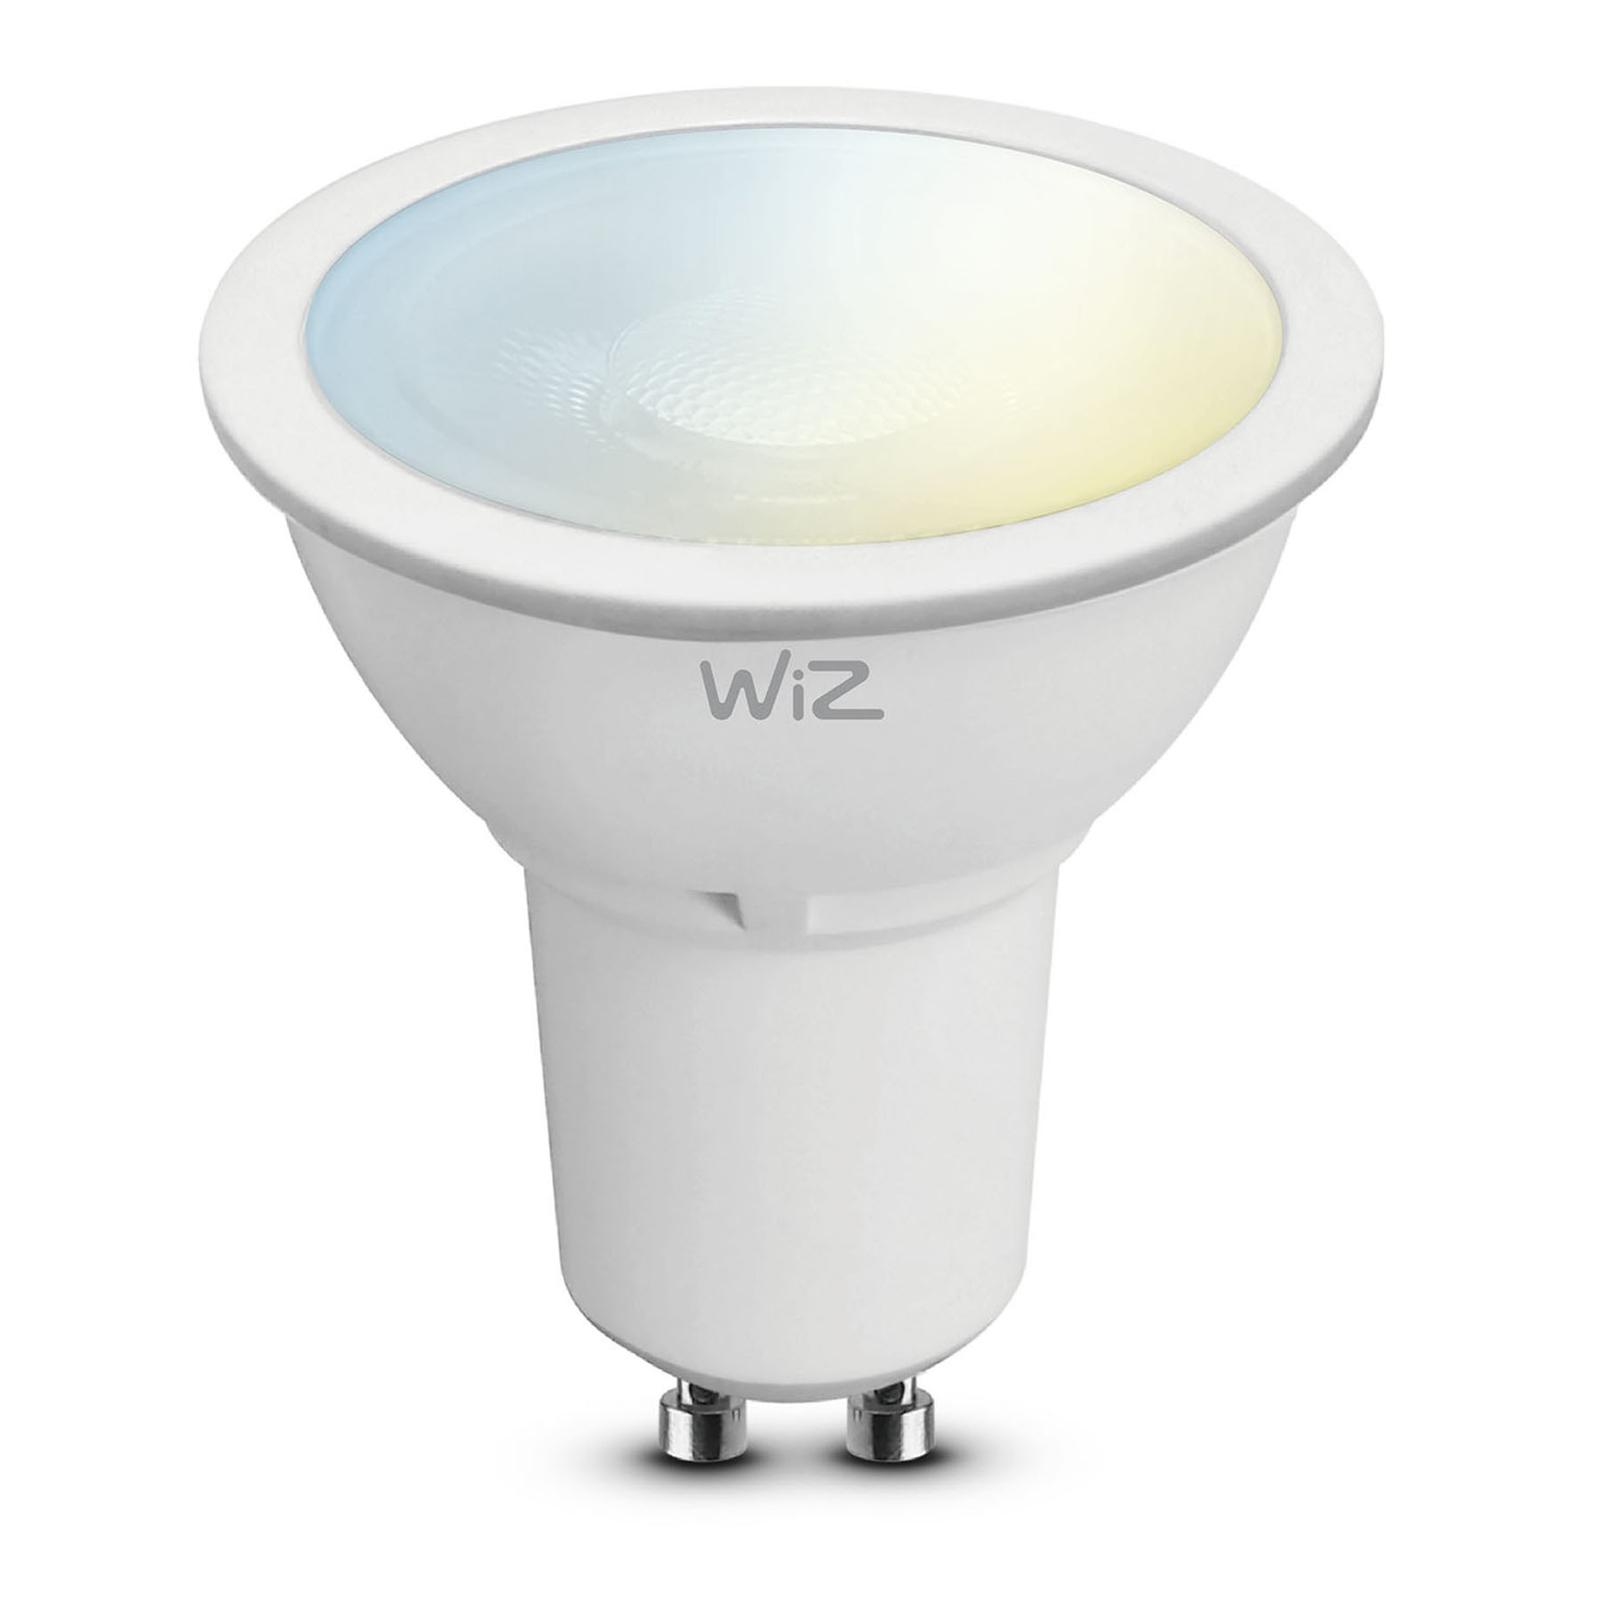 WiZ GU10 LED, Ø 5 cm, 5,5 W, 2.700 - 6.500 K